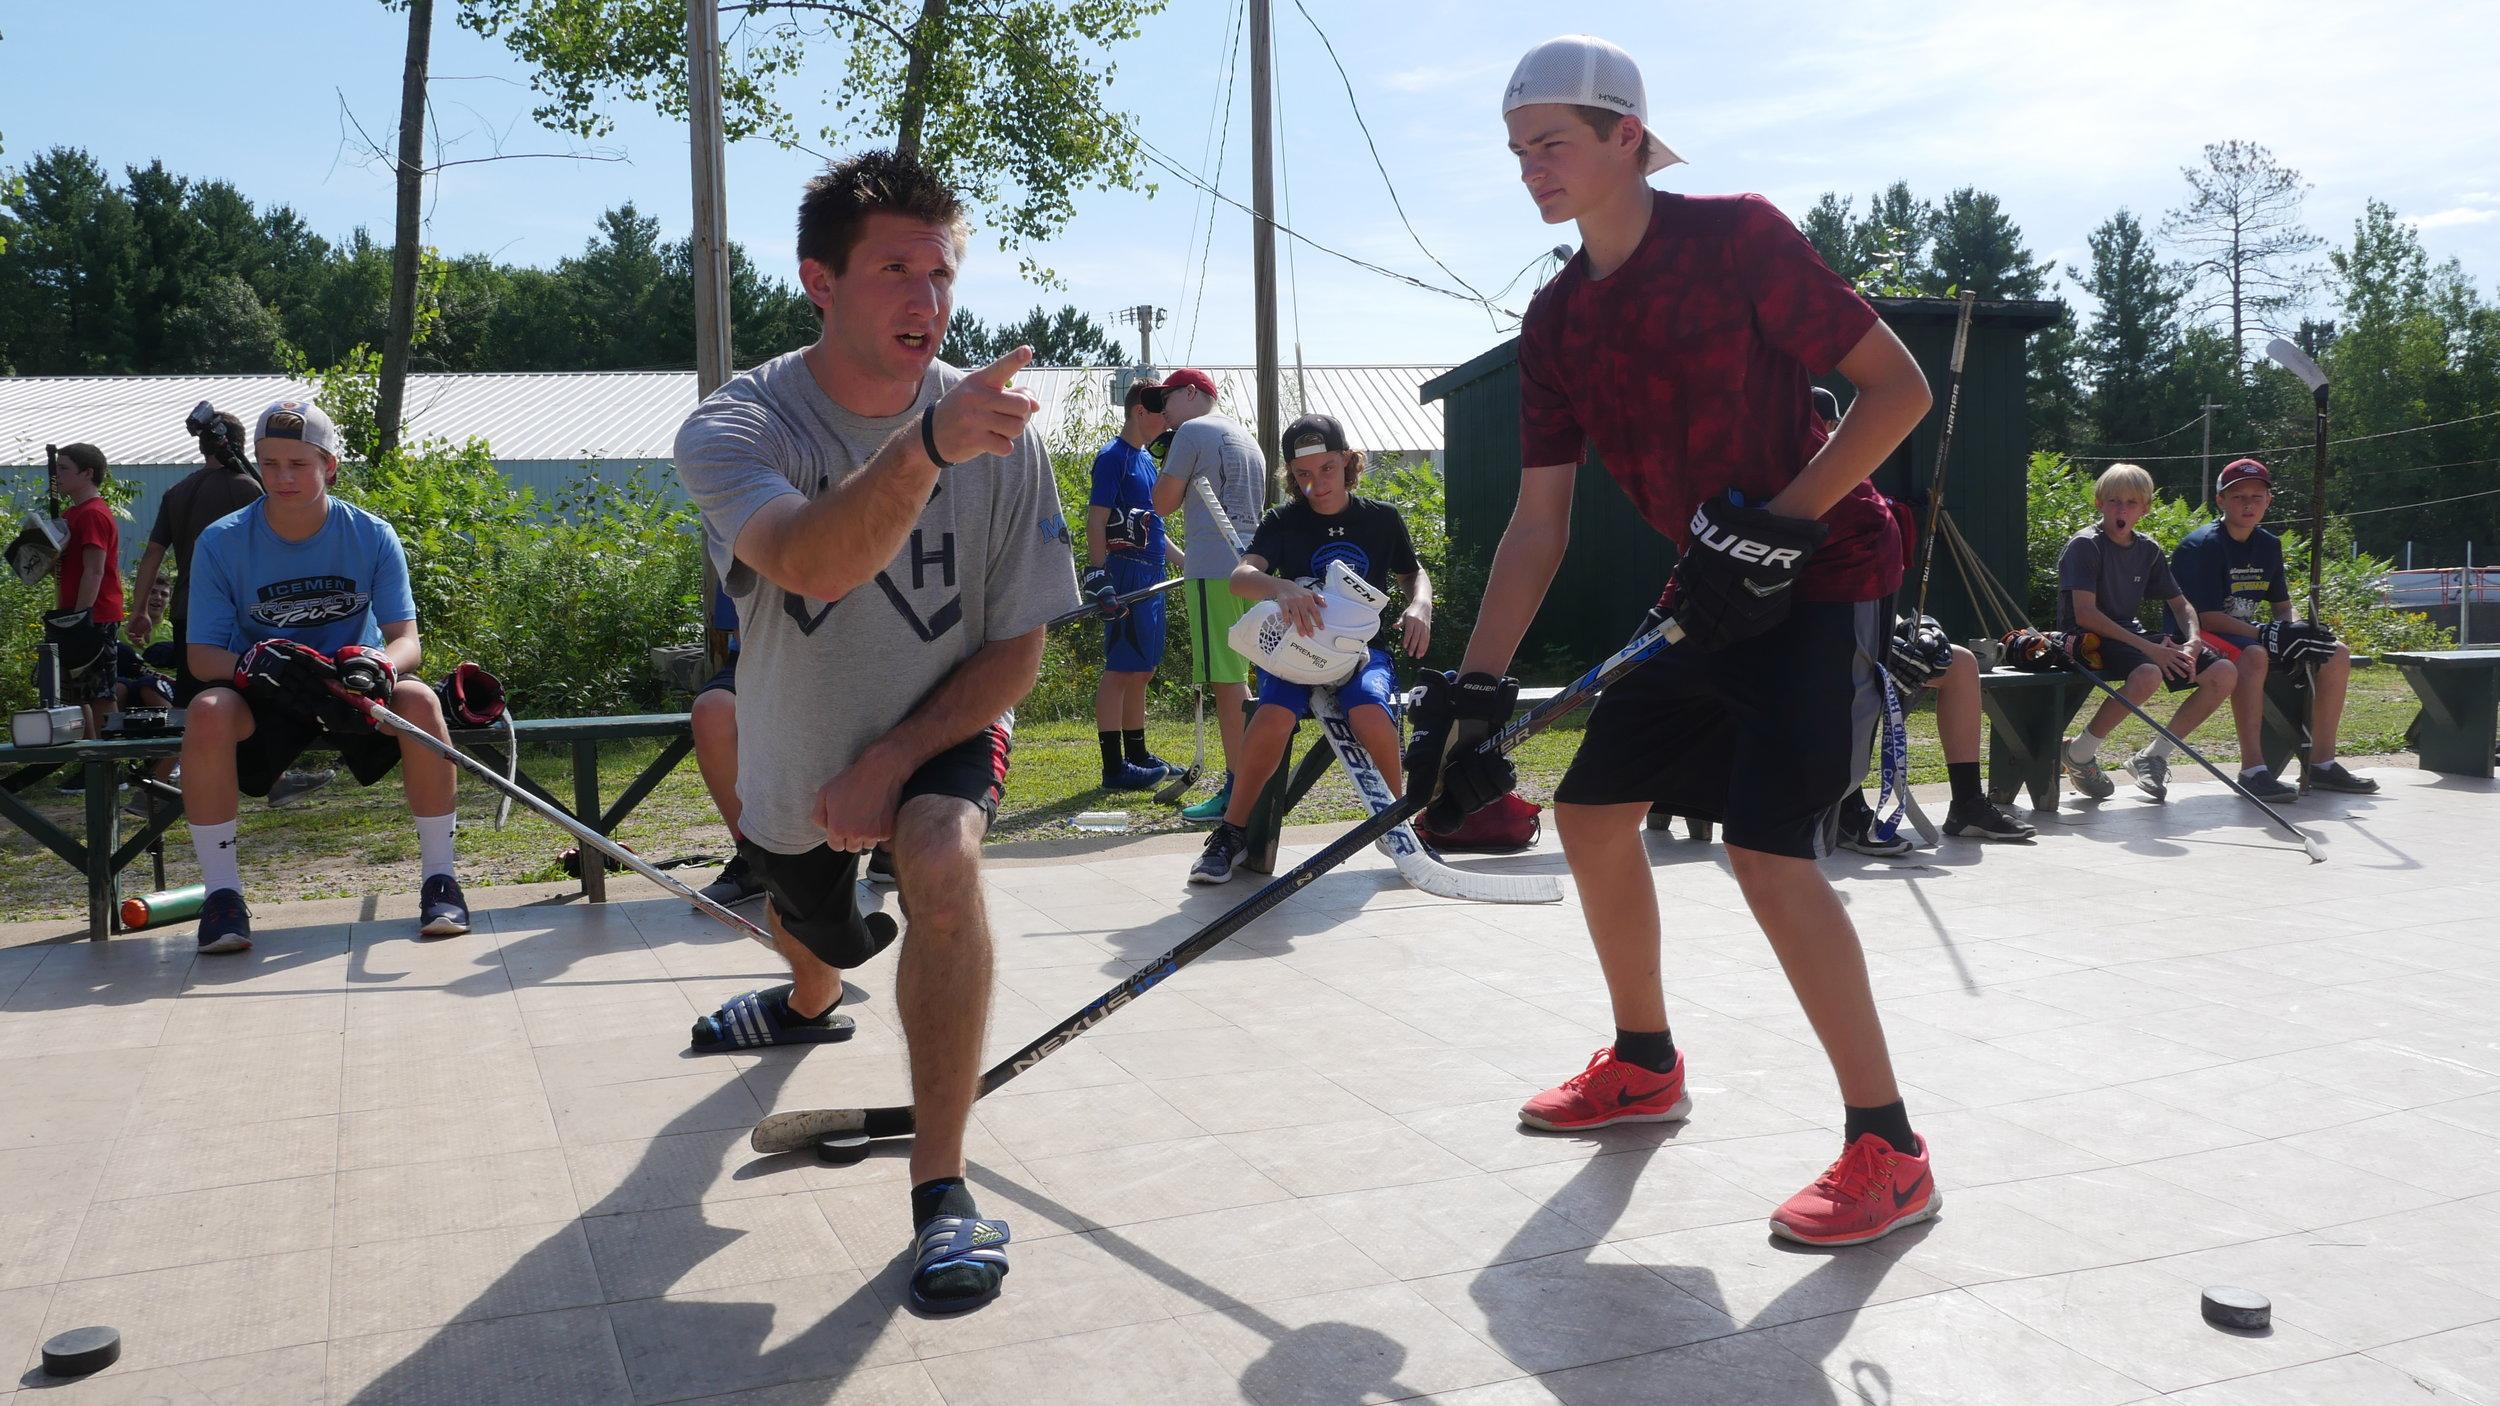 Hockey-Camp-Power-Shooting-Instructor.JPG